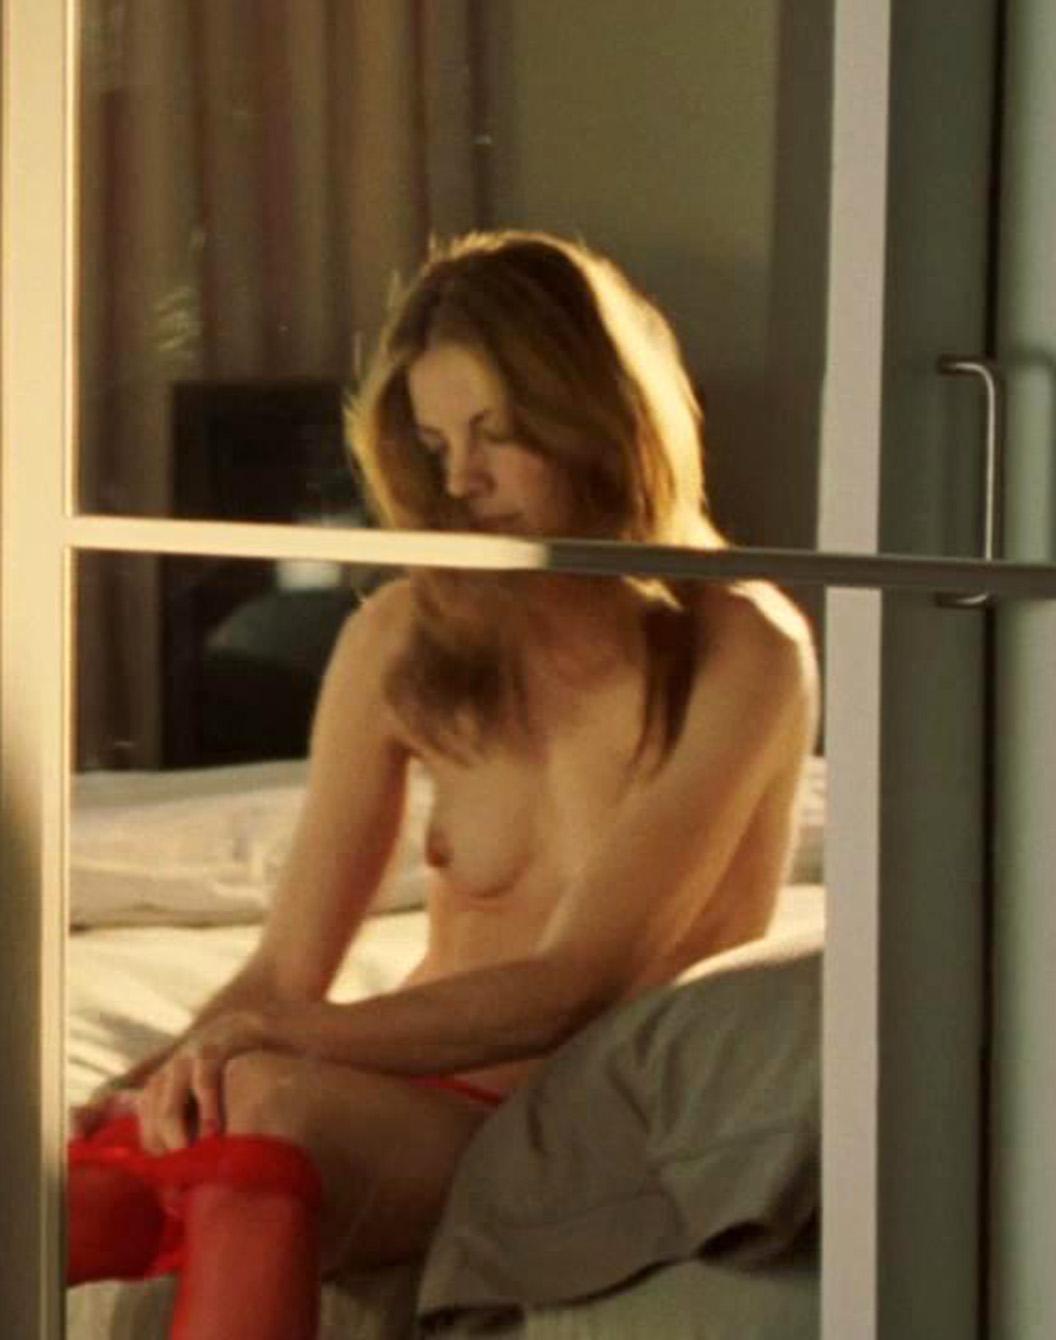 michelle monaghan having sex